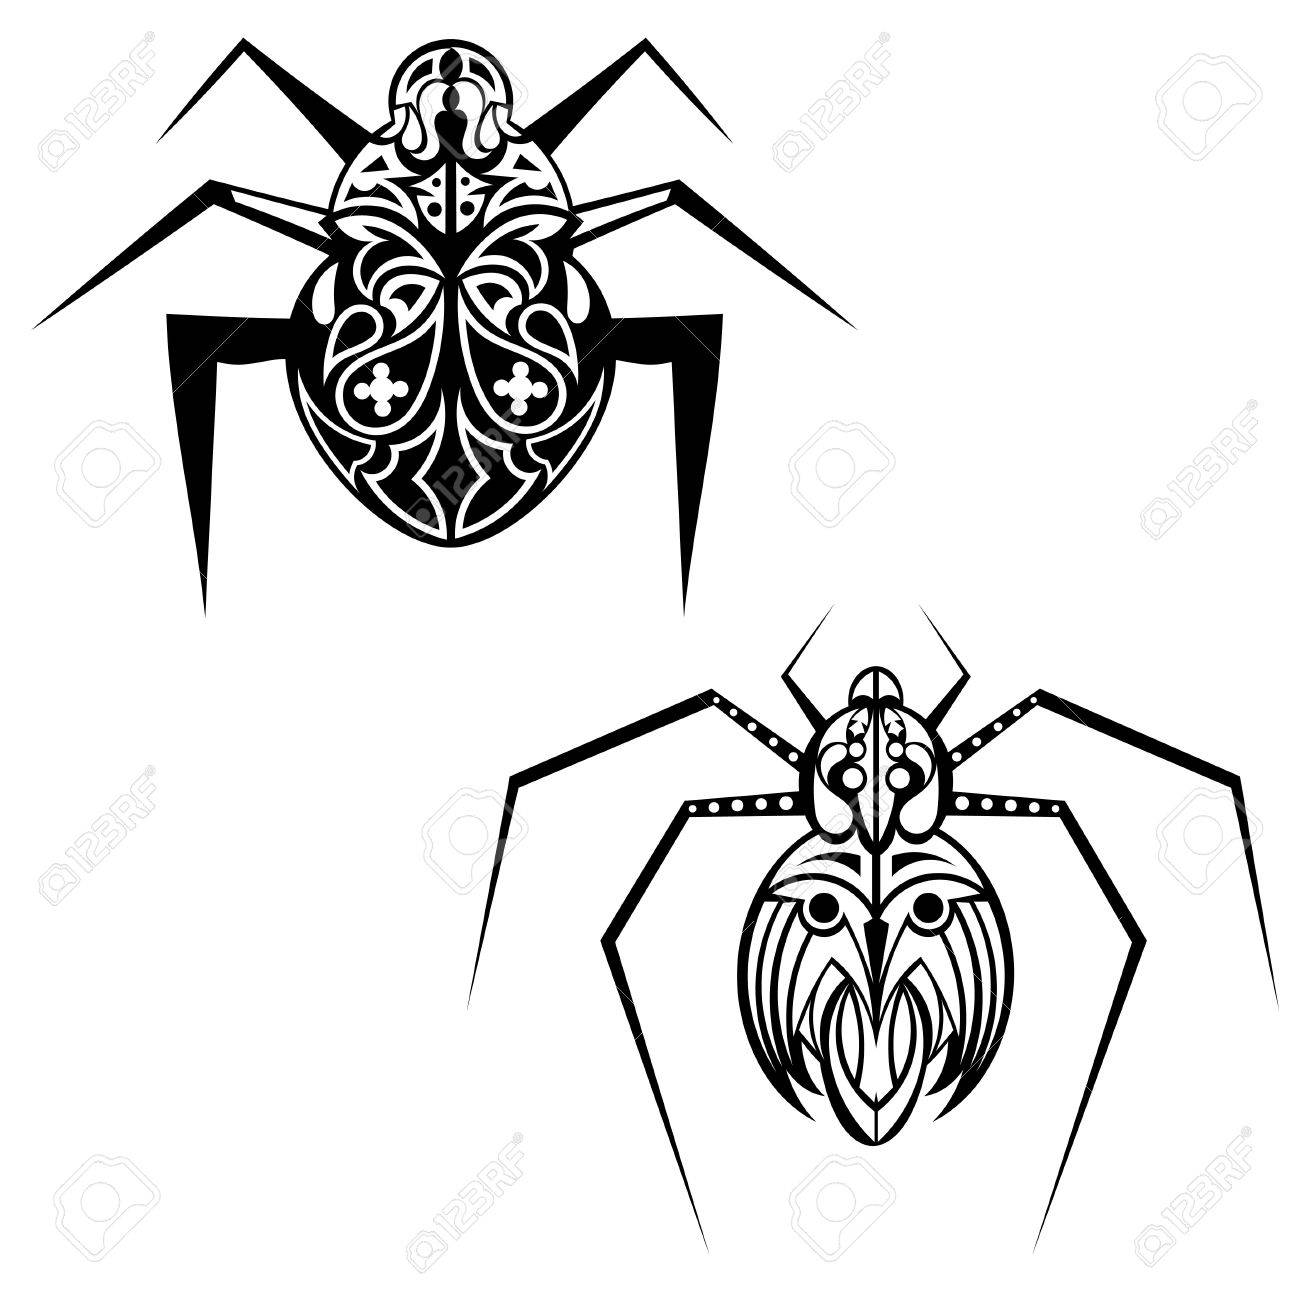 Spider tattoo Stock Vector - 18026513